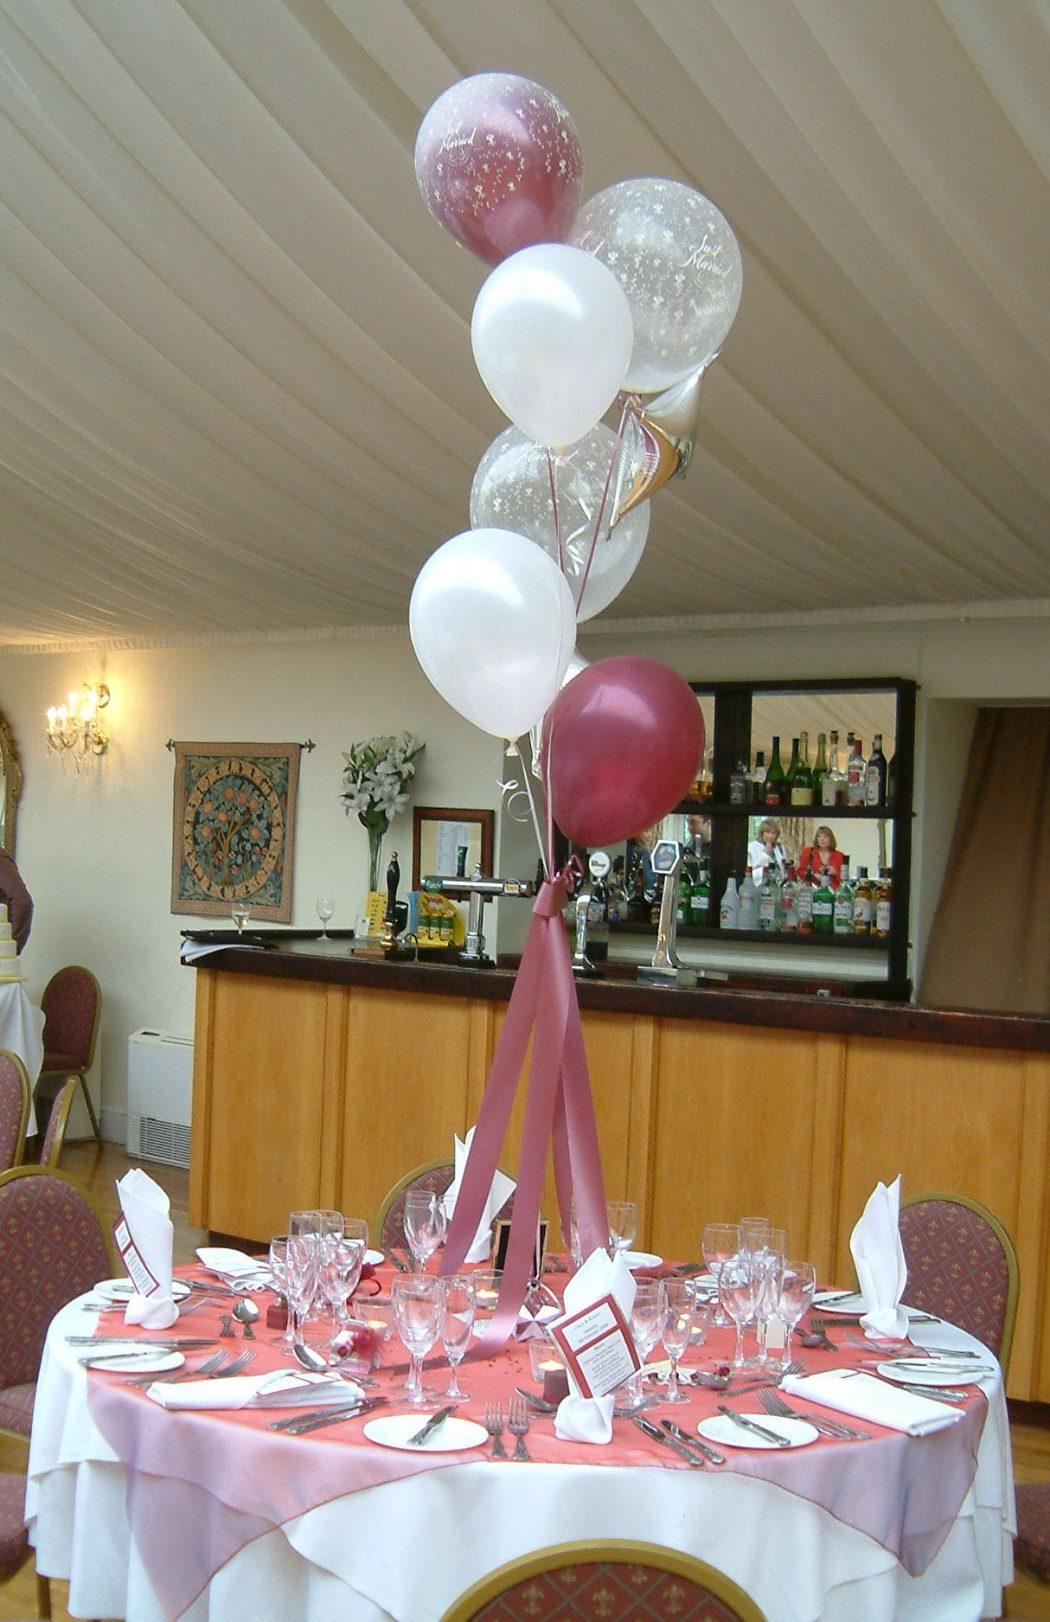 Wedding-Table-Decoration-Idea Wonderful ideas for decorating your wedding